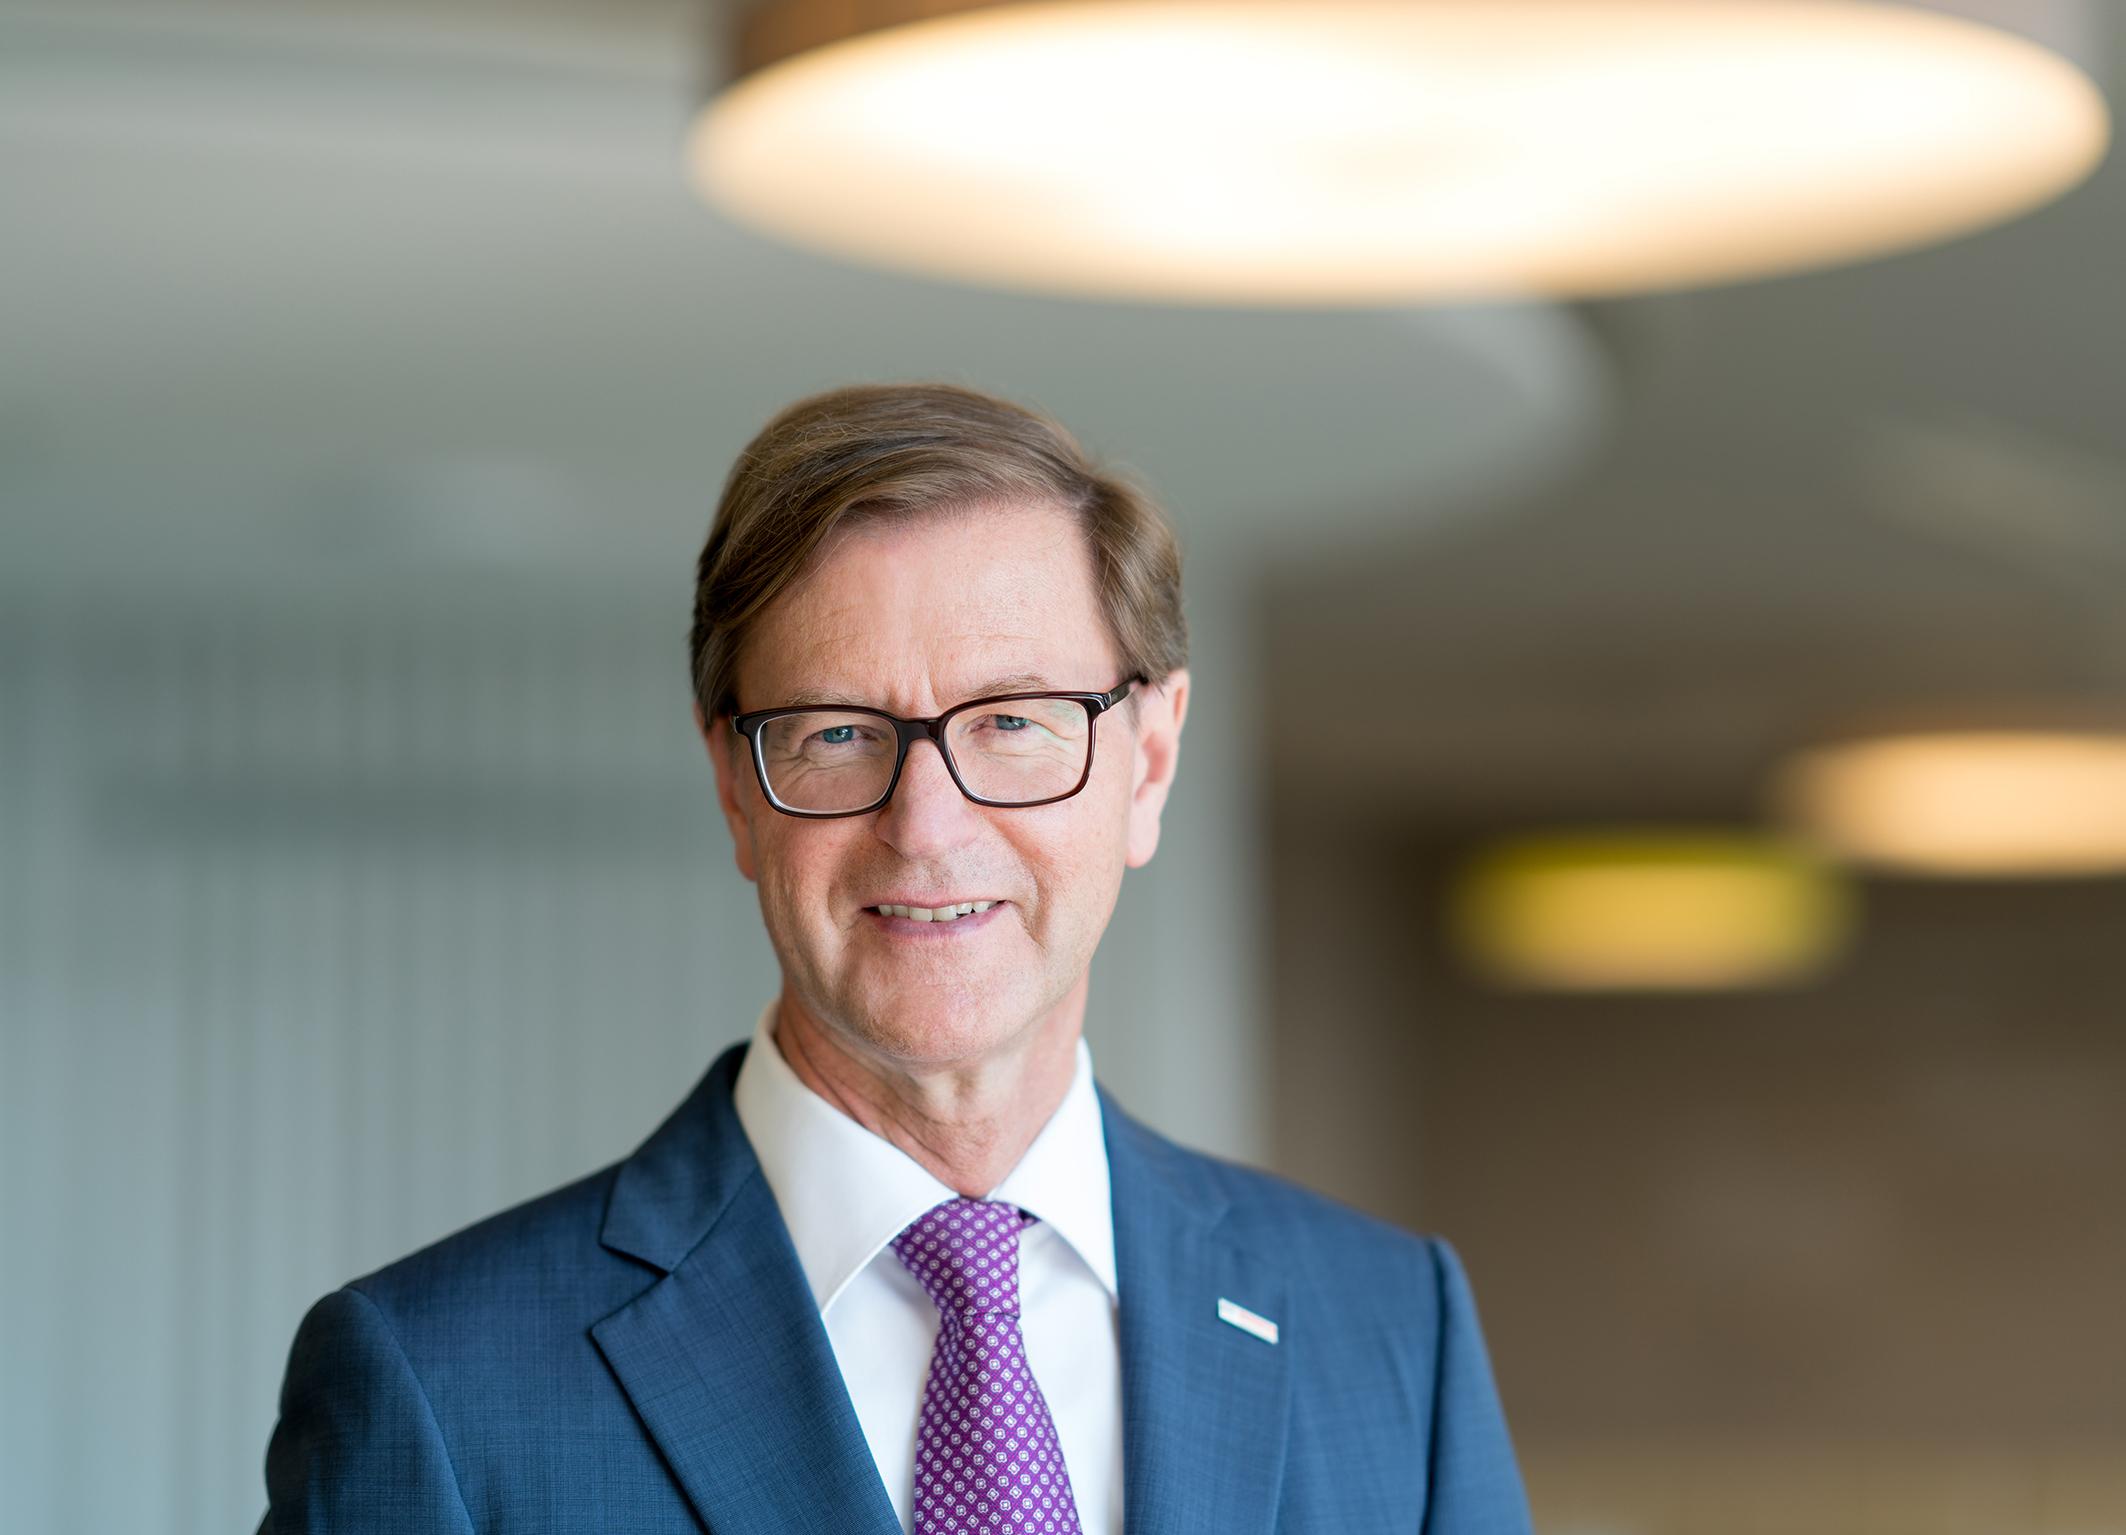 Prof. Dr. Stefan Asenkerschbaumer;Prof. Dr. rer. pol. Stefan Asenkerschbaumer